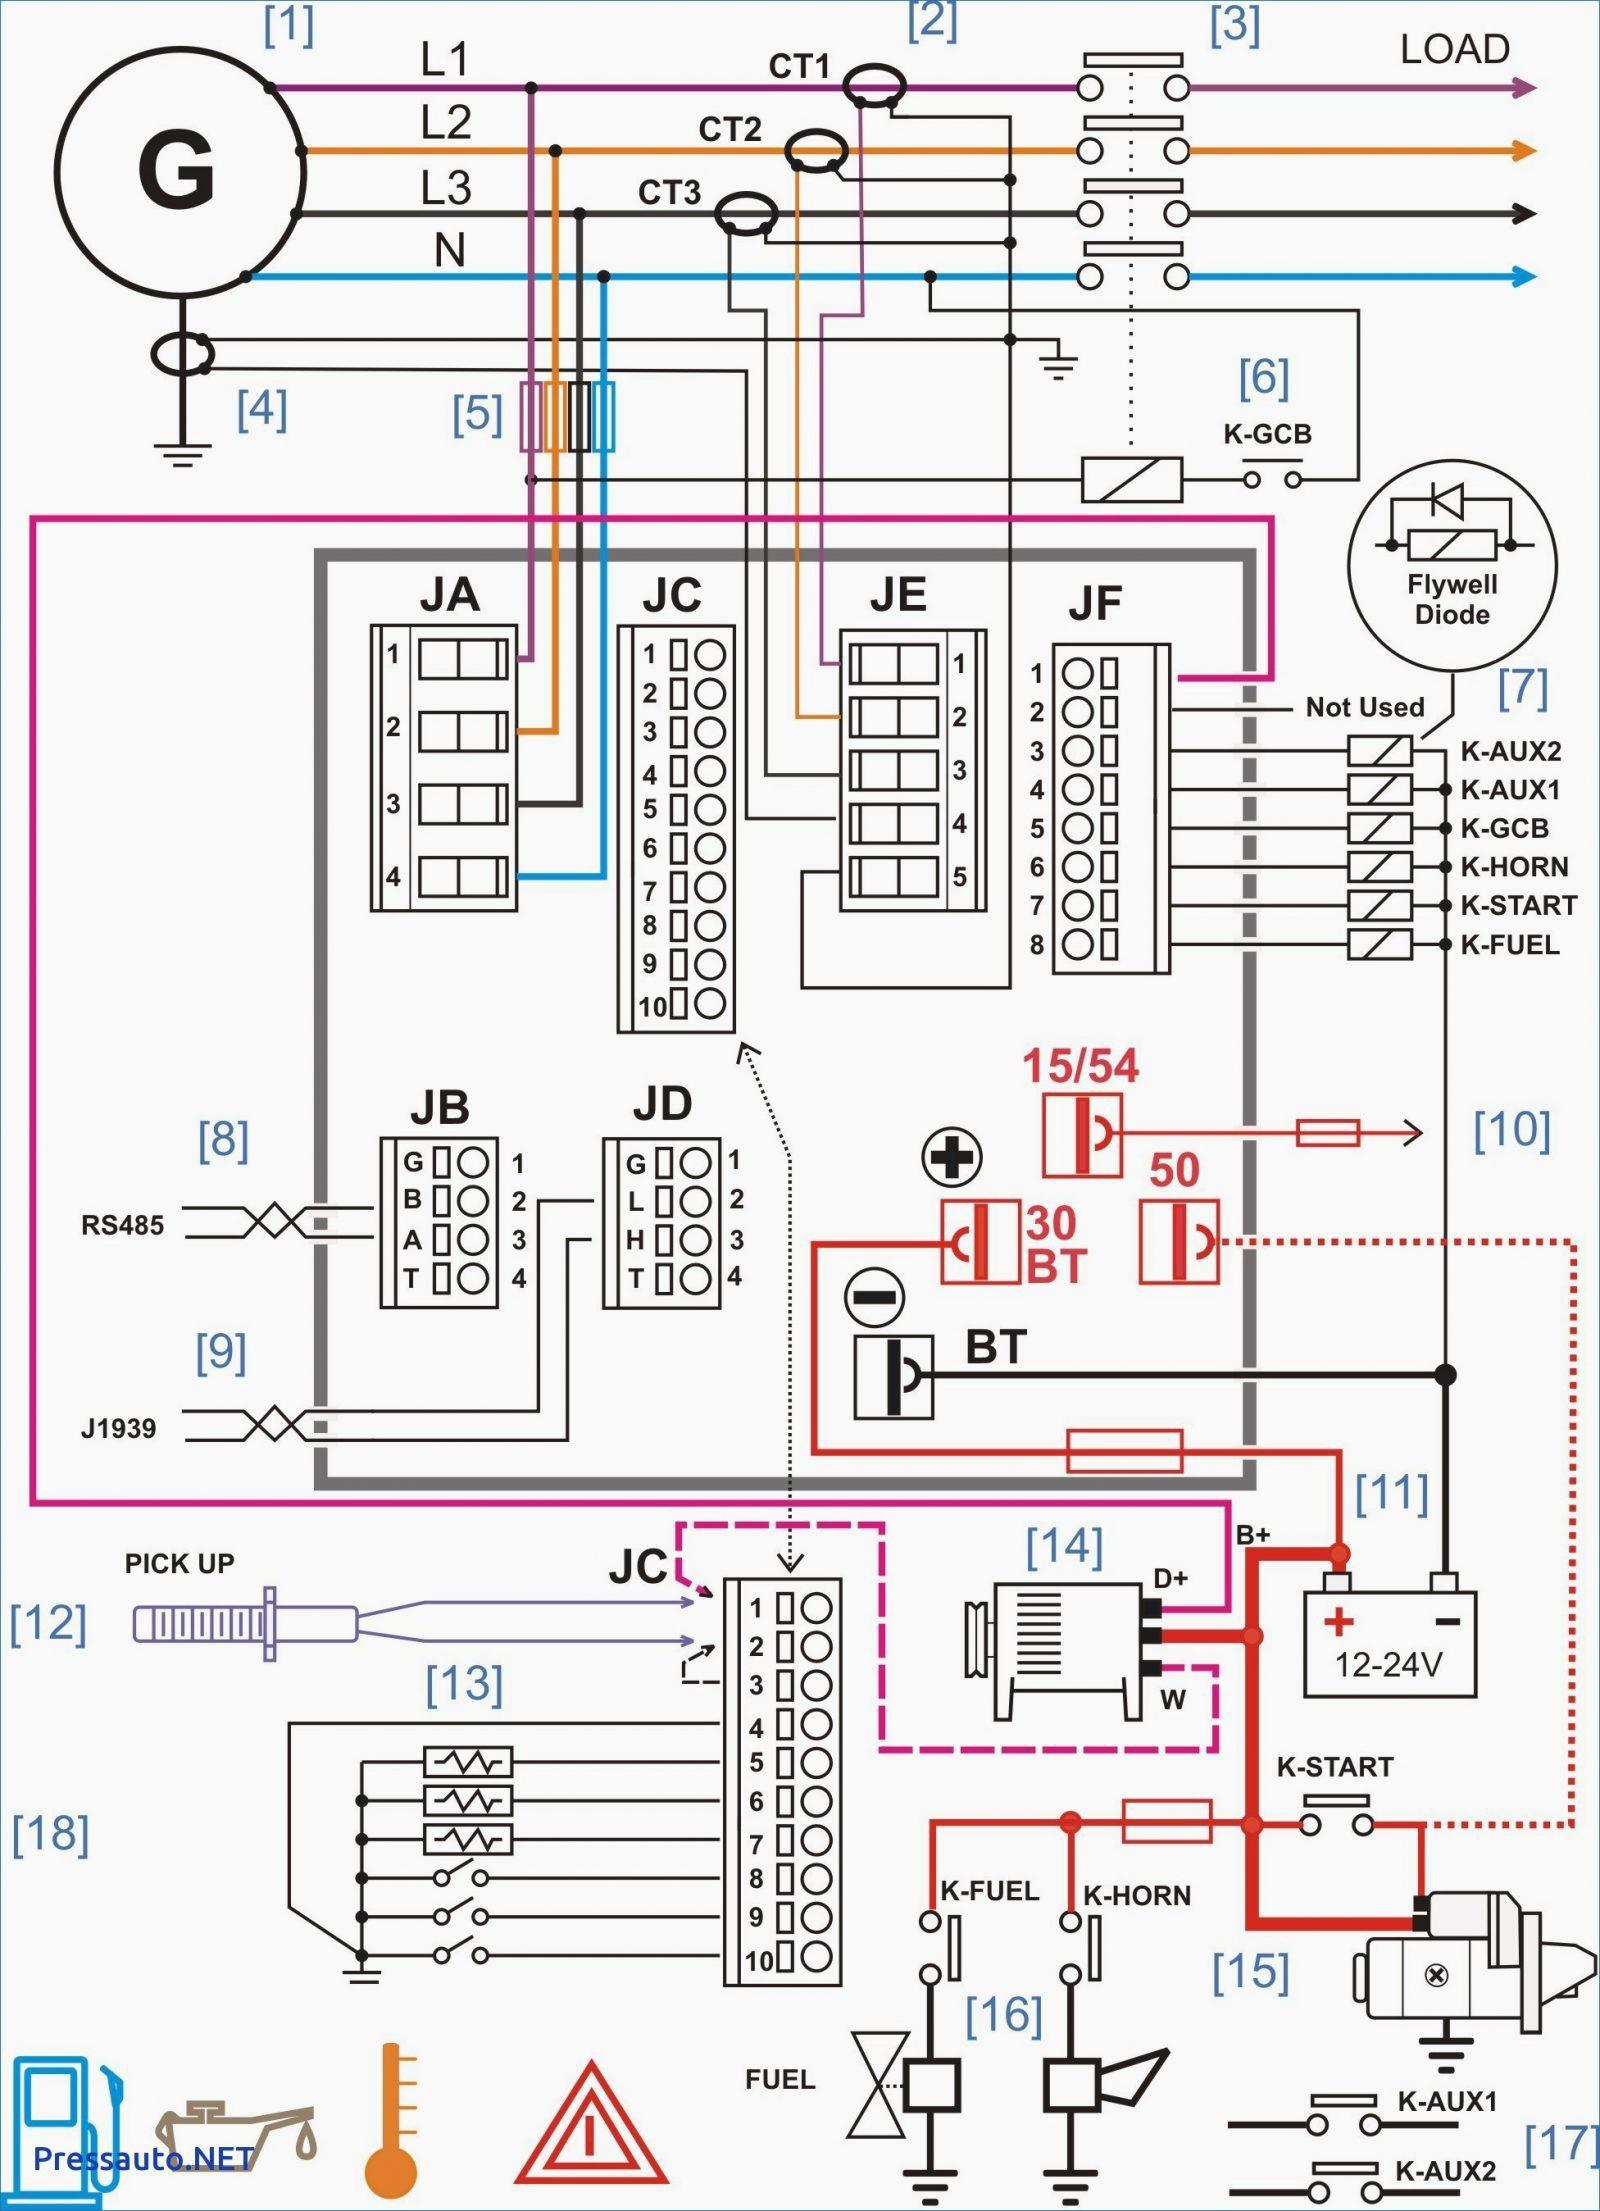 manual transfer switch wiring diagram Collection-Generac Manual Transfer Switch Wiring Diagram Luxury Generac Transfer Switch Wiring Diagram Lovely Diagram Manual 19-s